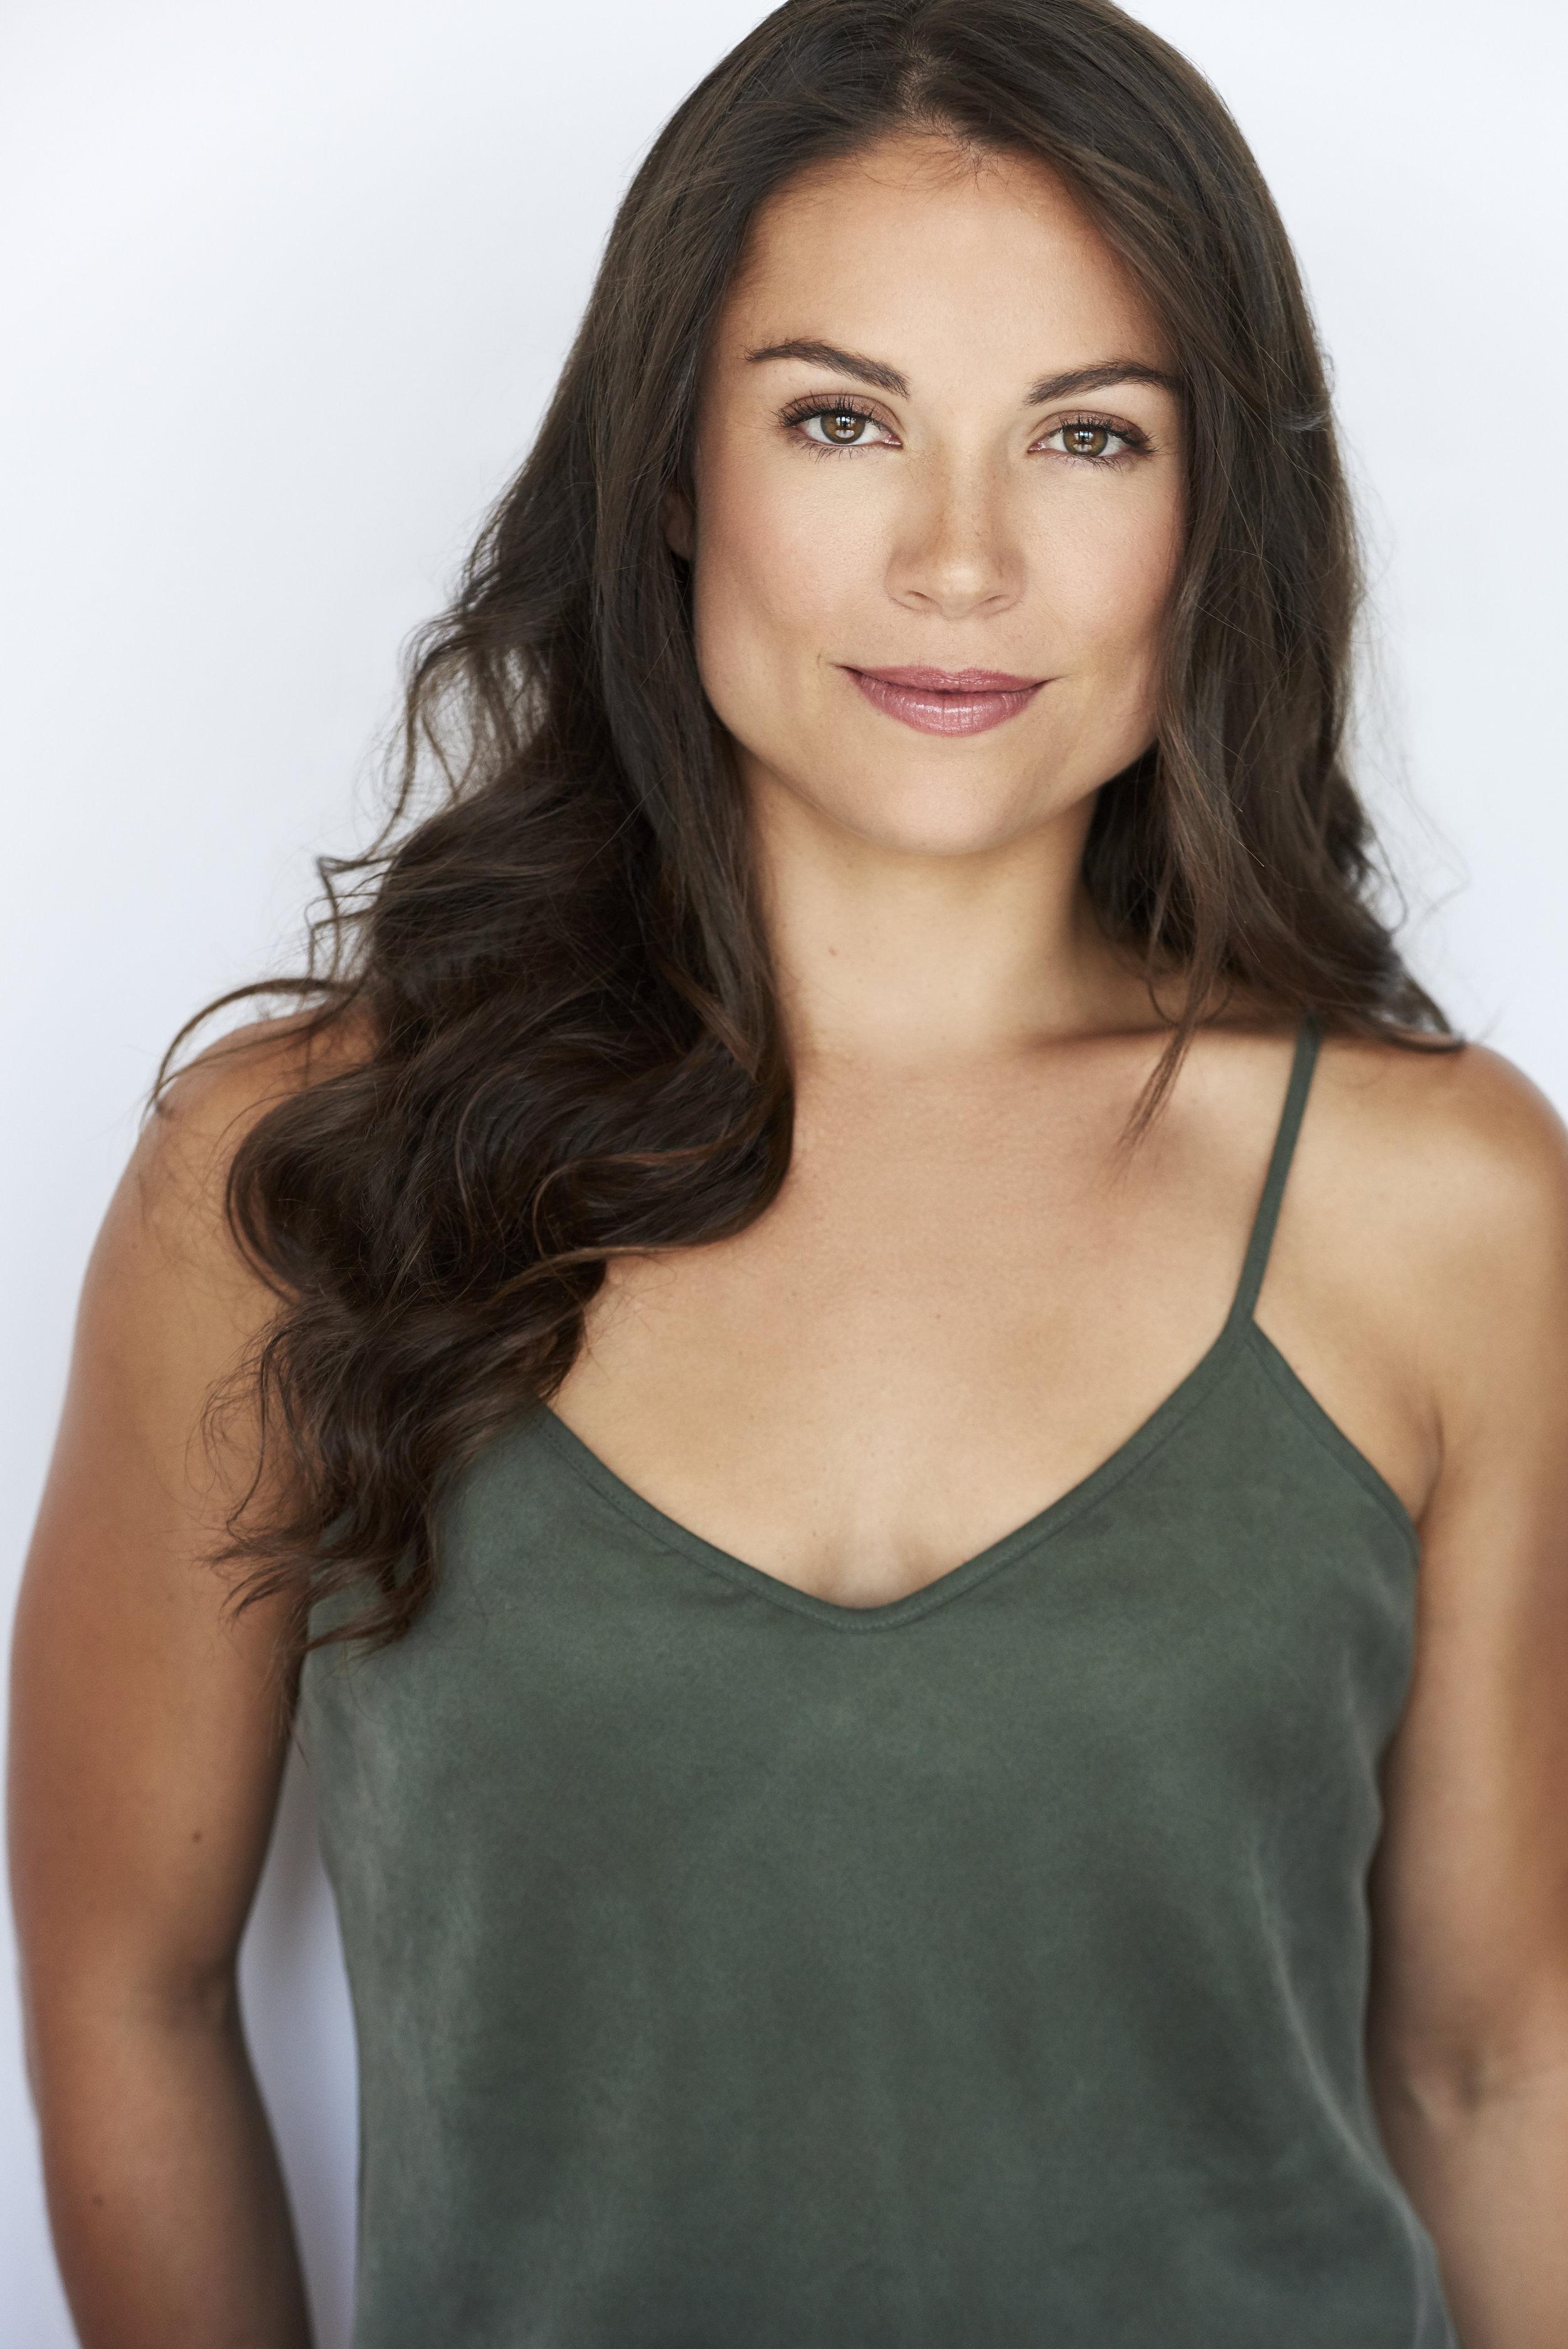 Nikki Croker